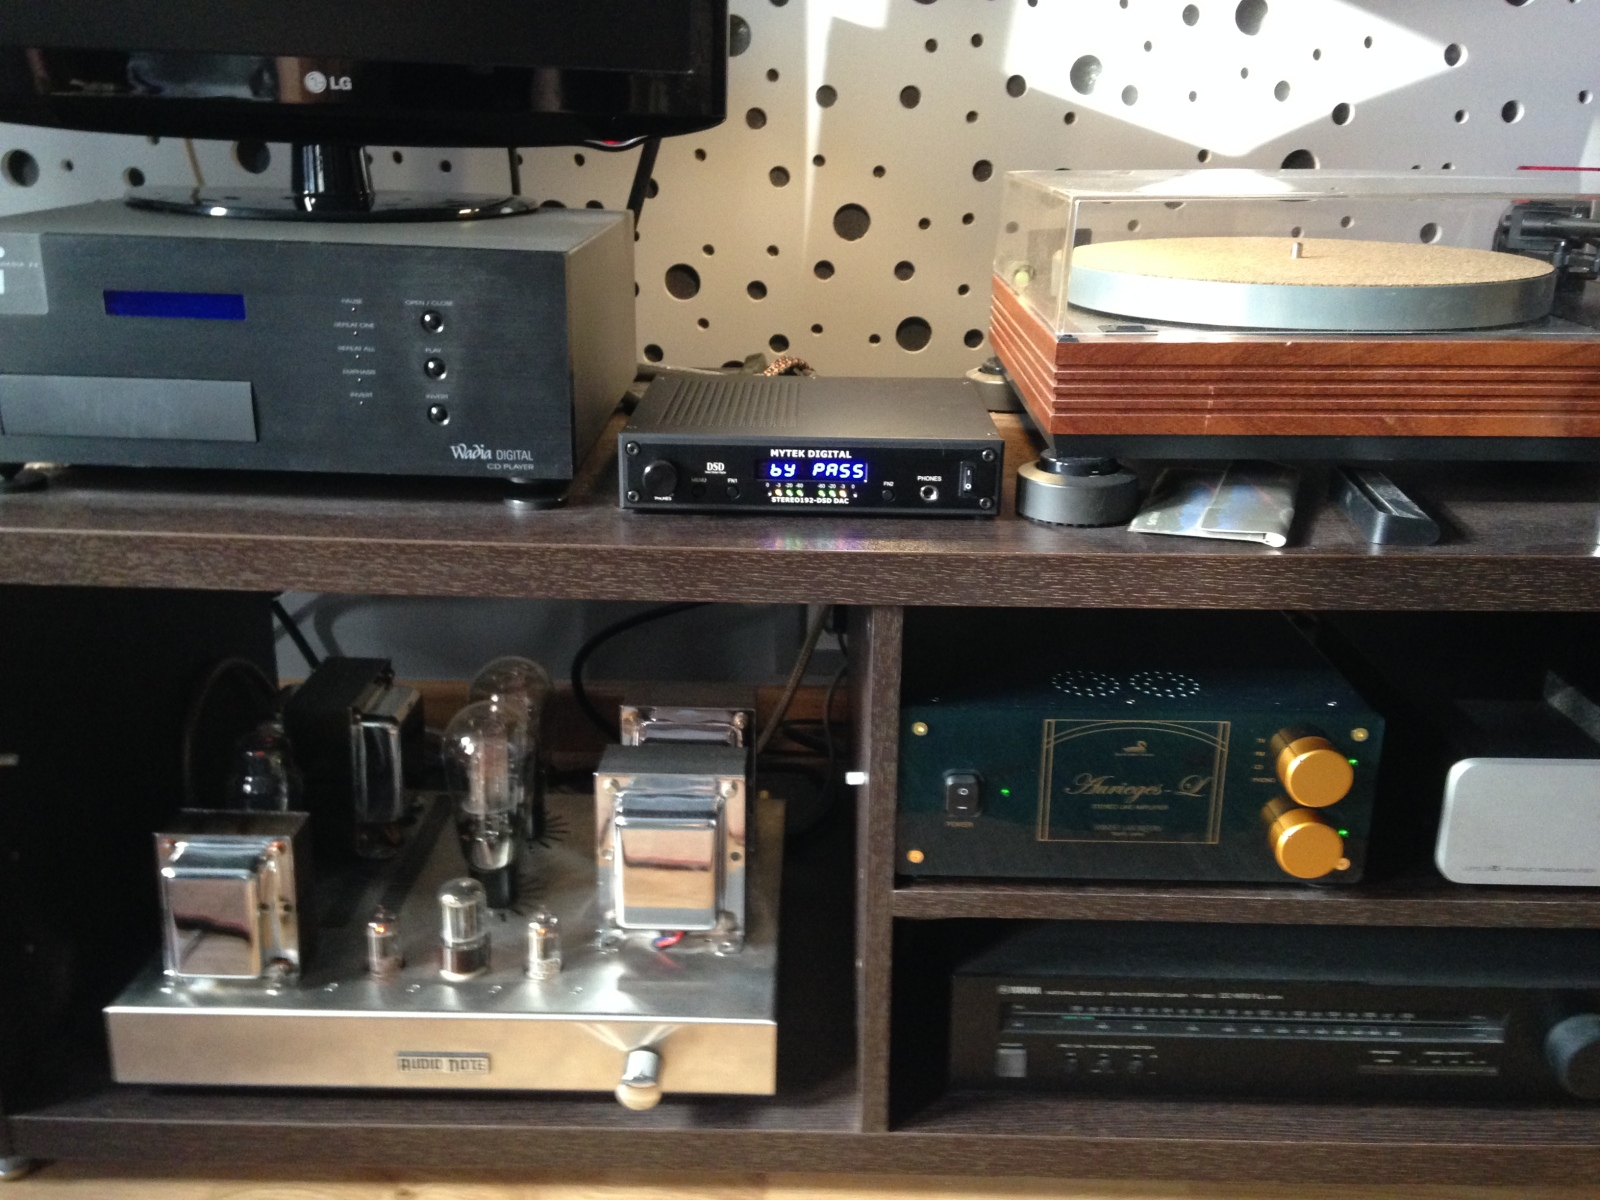 Mytek Digital Stereo 192 DSD-DAC Preamp BK 4s194x